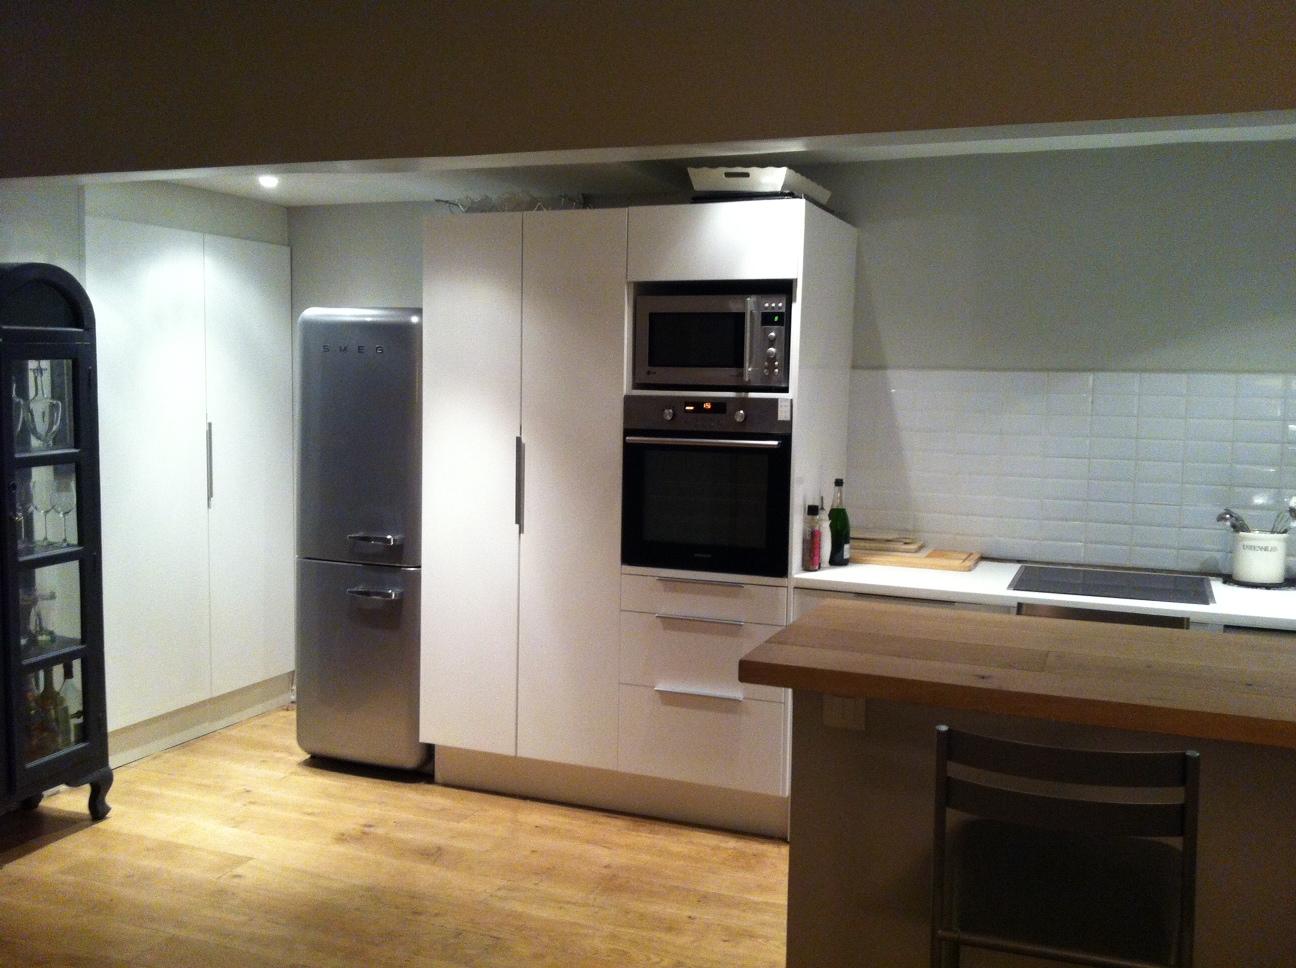 Ikea cuisine metod placard cuisine ikea metod hyttan Meuble colonne cuisine porte coulissant ikea metod